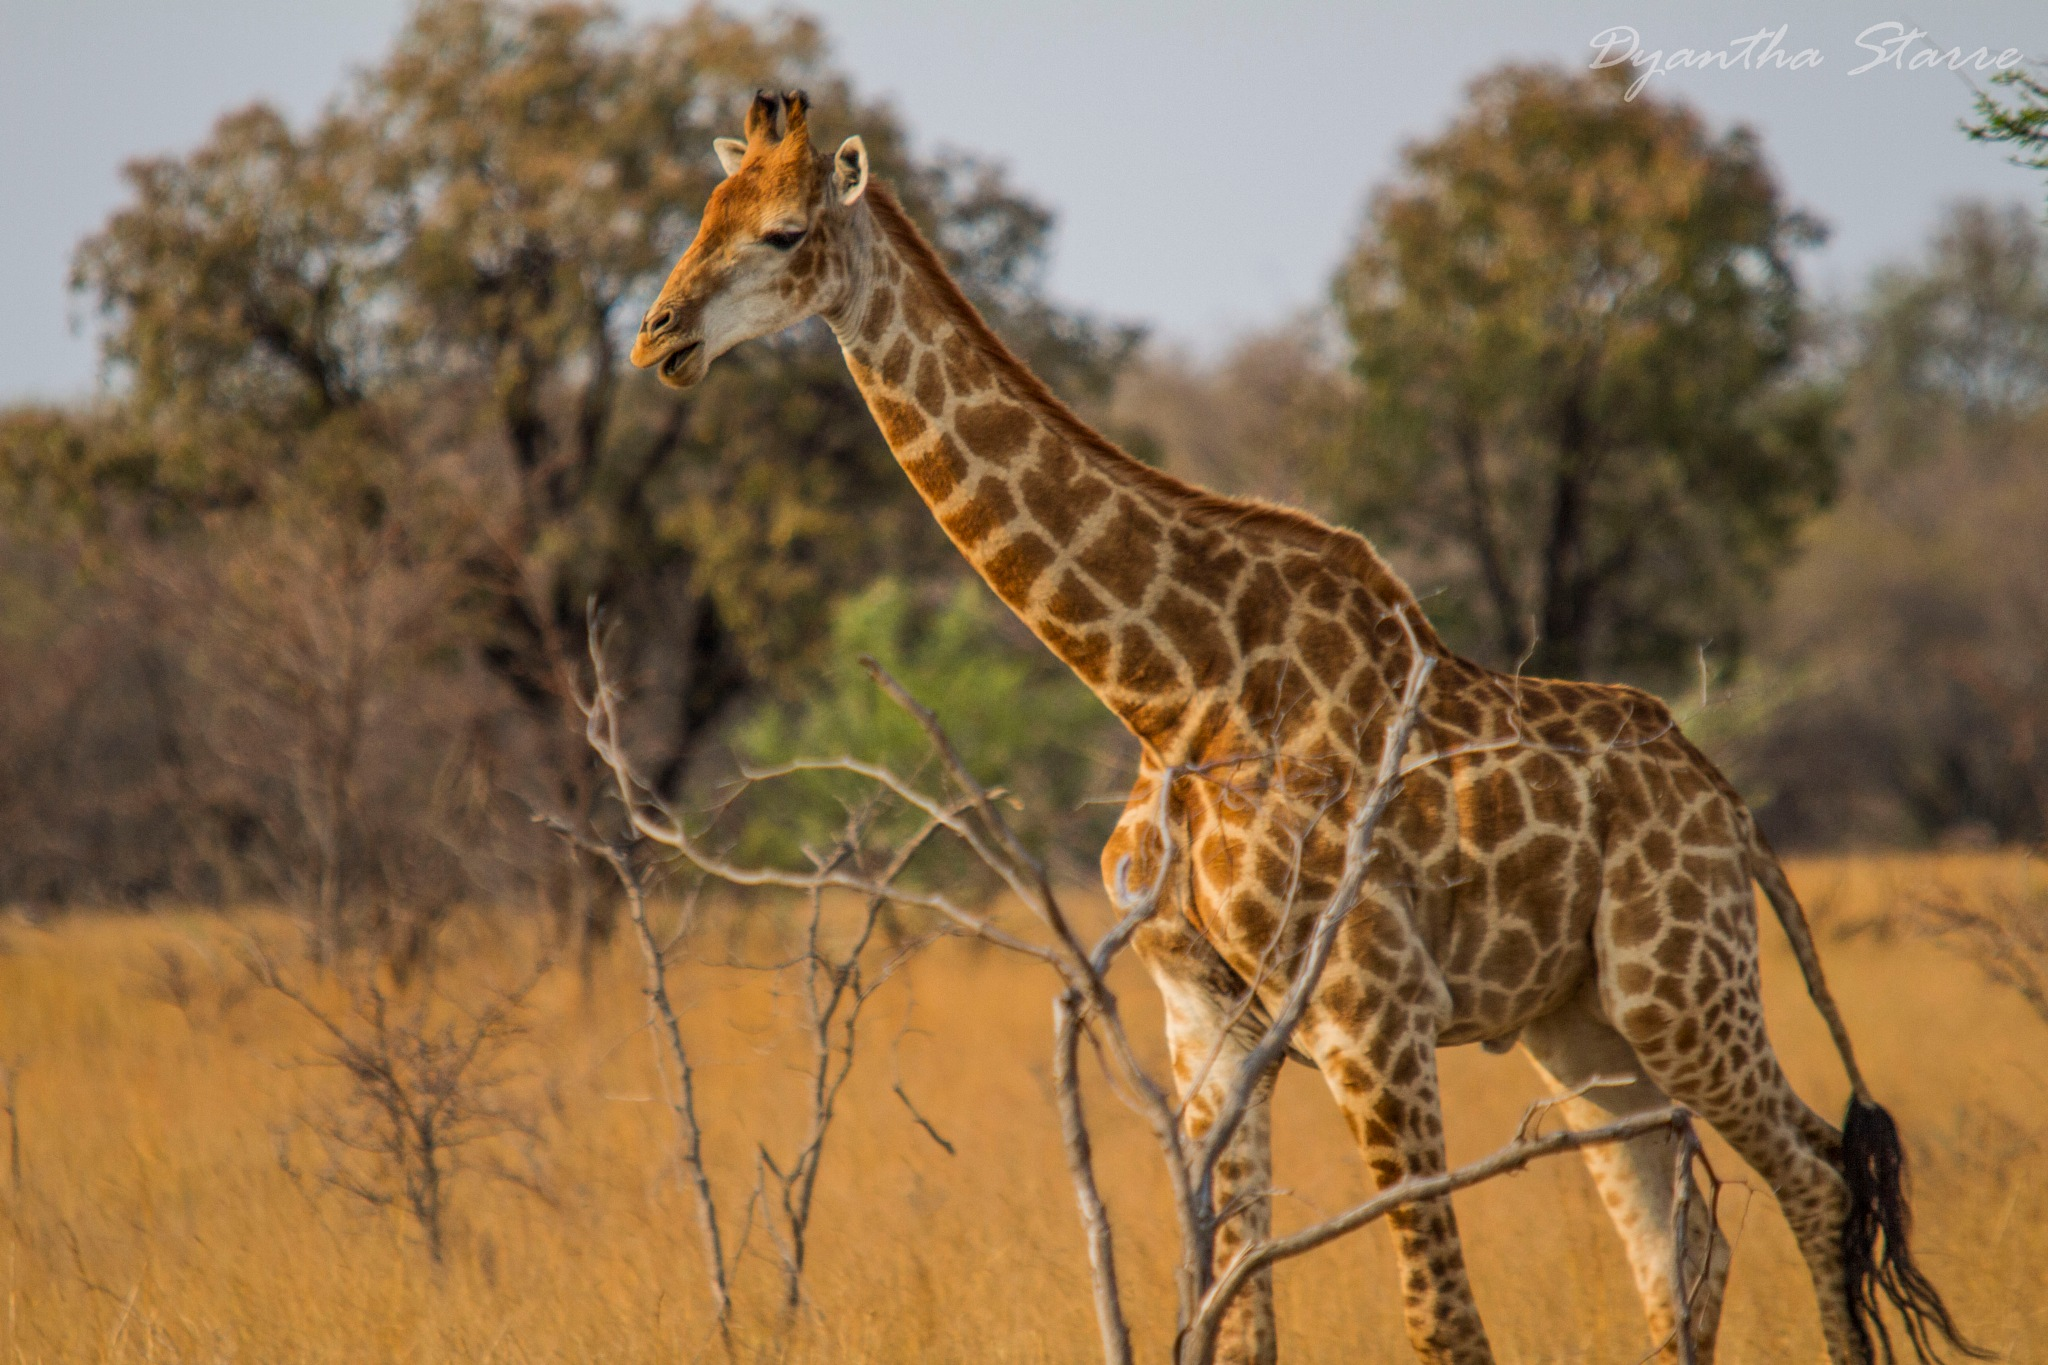 Giraffe by Dyantha Starre